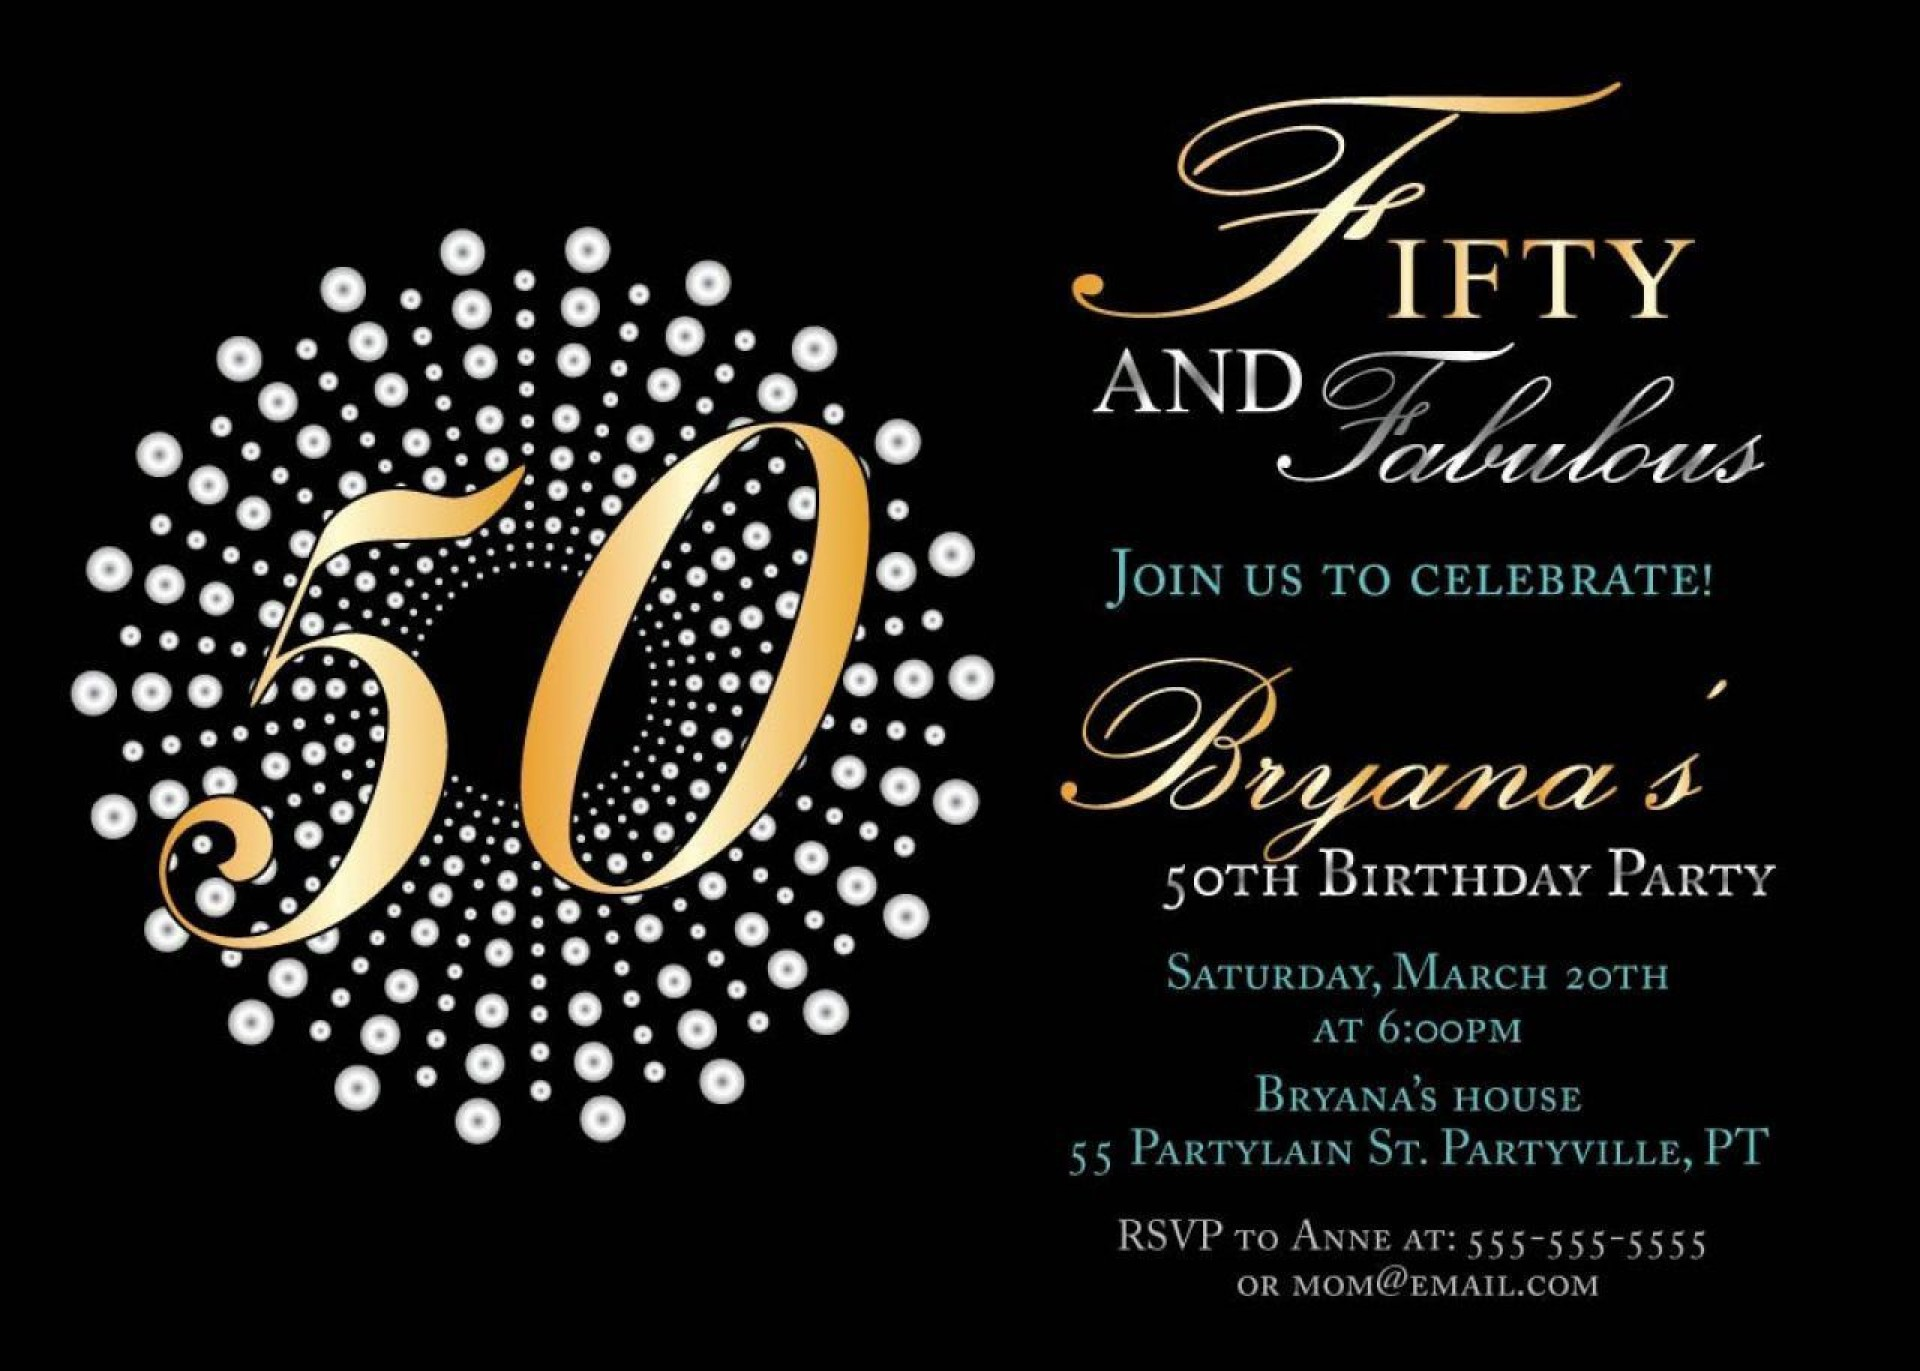 005 Stirring Surprise 50th Birthday Invitation Template Word Free Example 1920